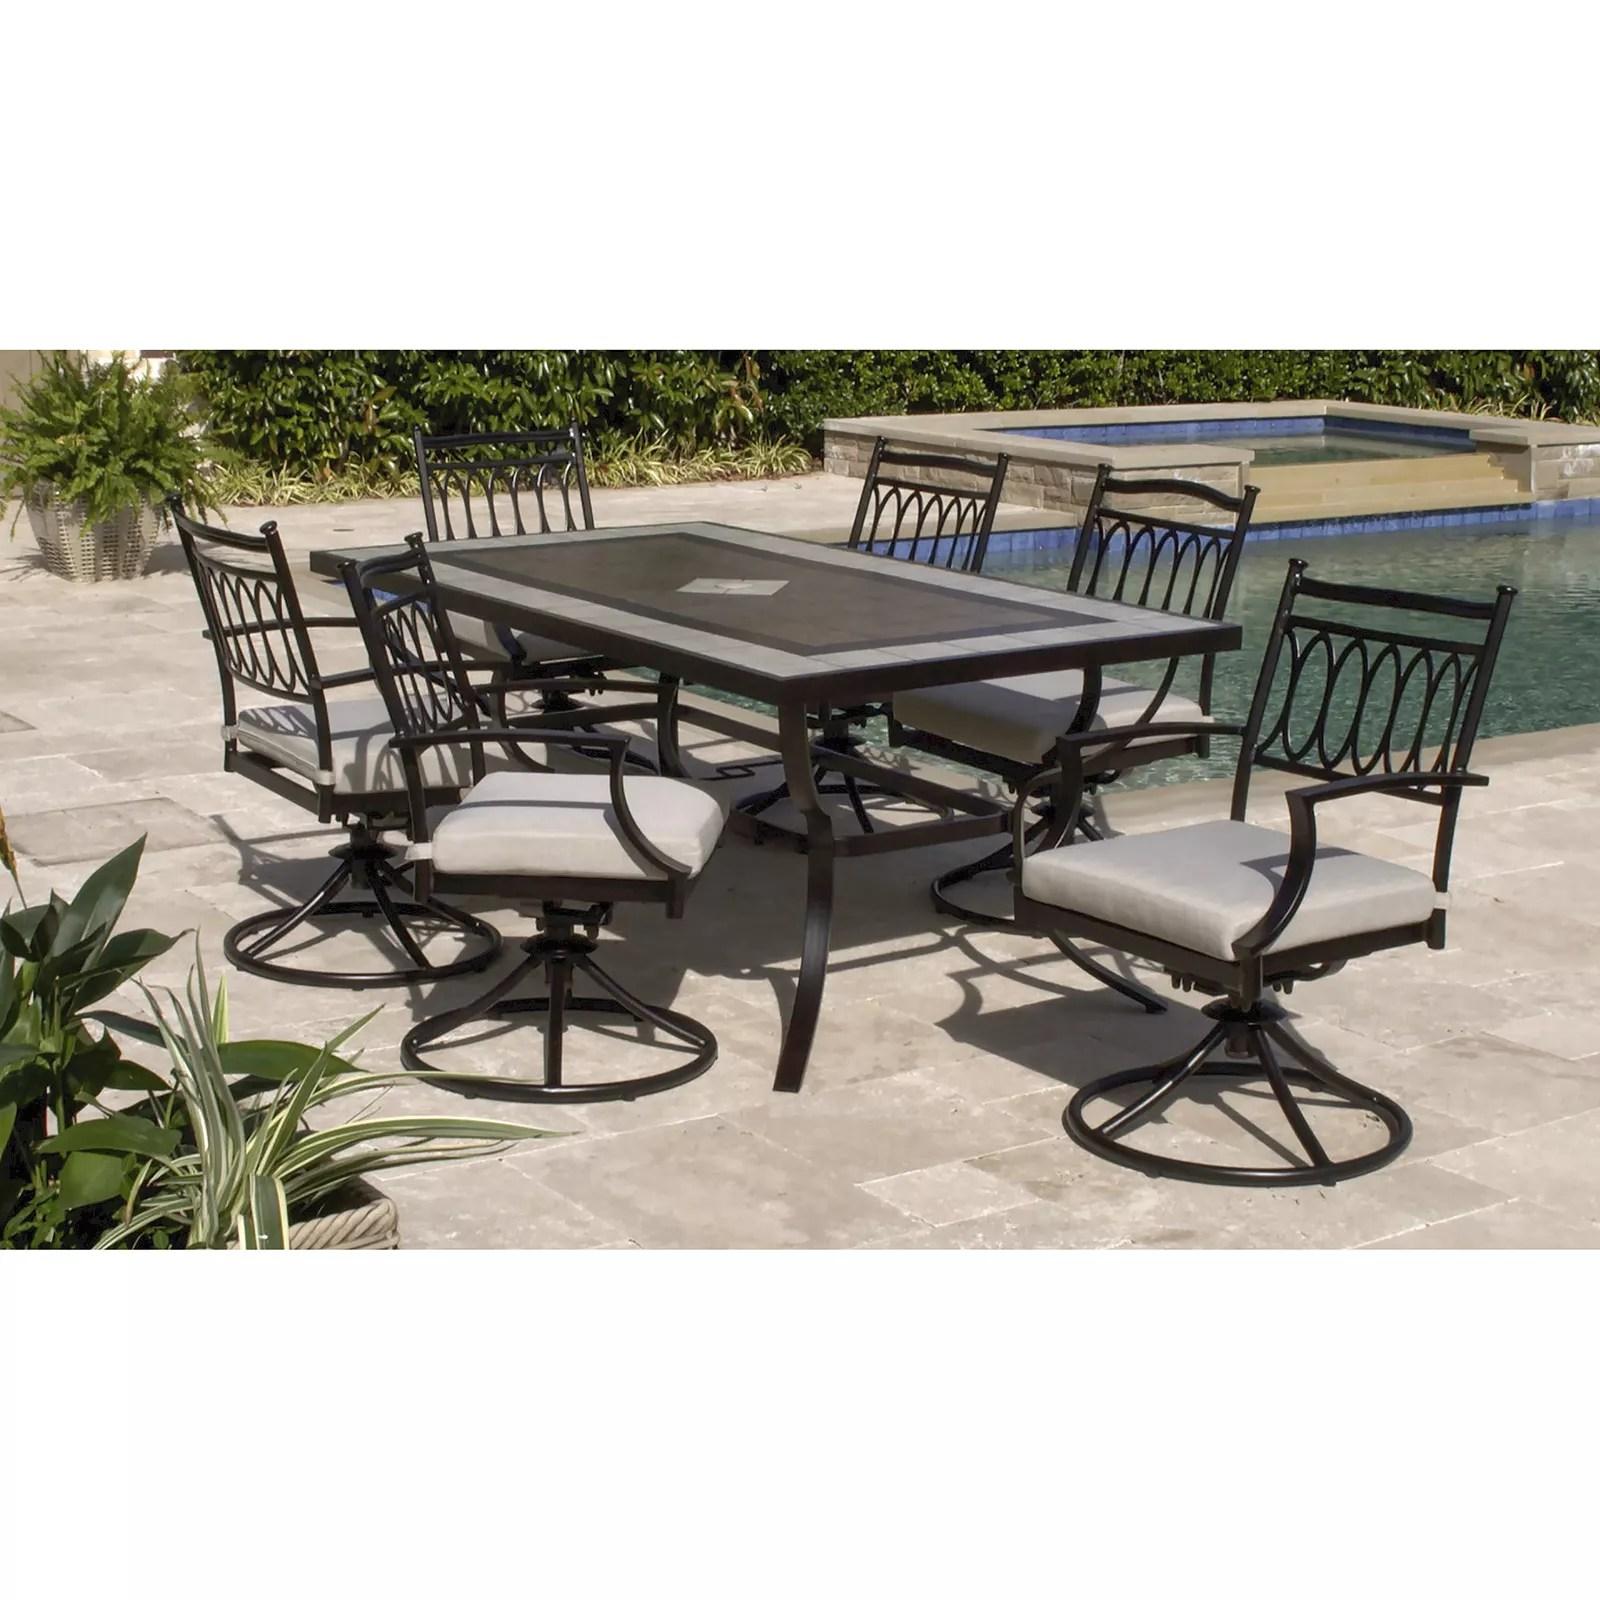 berkley jensen cape may 7pc aluminum dining set with swivel chairs